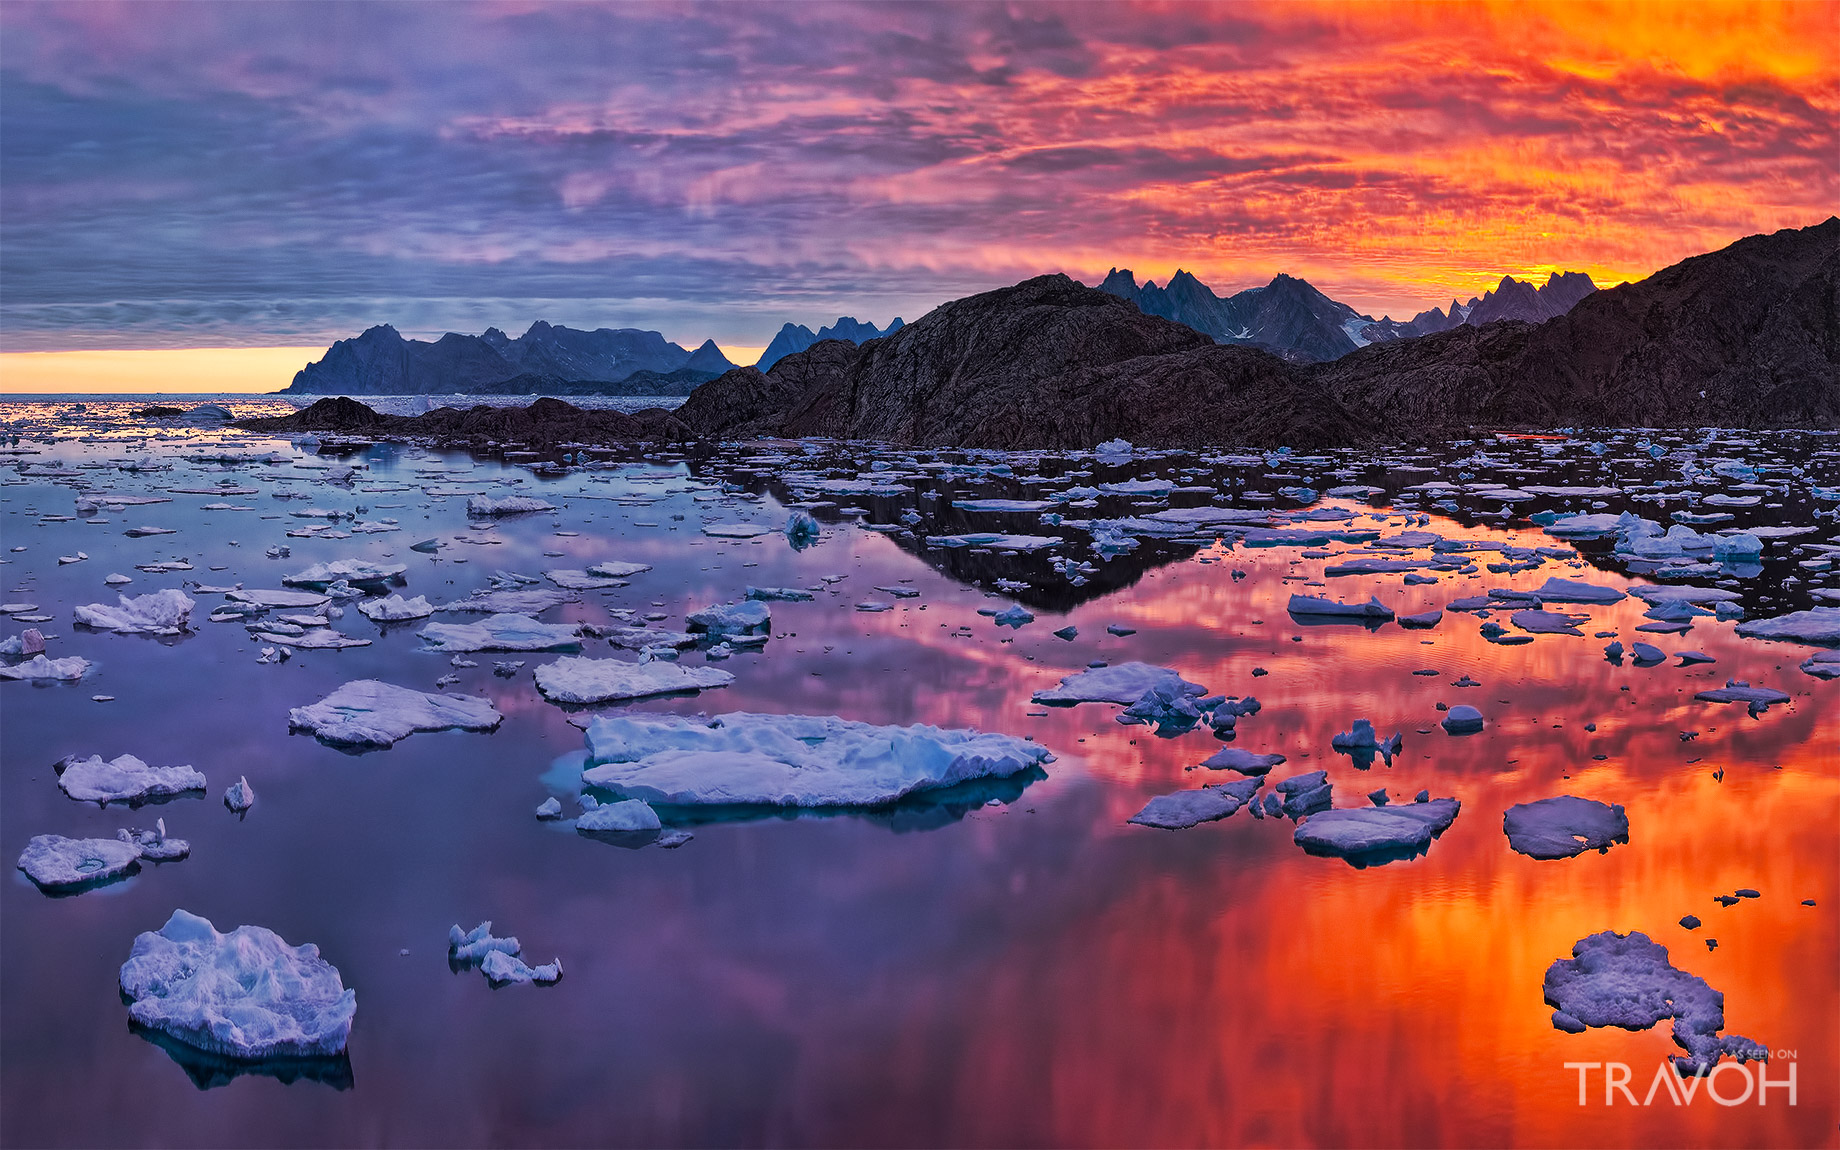 Arctic Sunset in Kulusuk, Sermersooq, Greenland at Torsuut Tunoq Sound over Angmagssalik Island